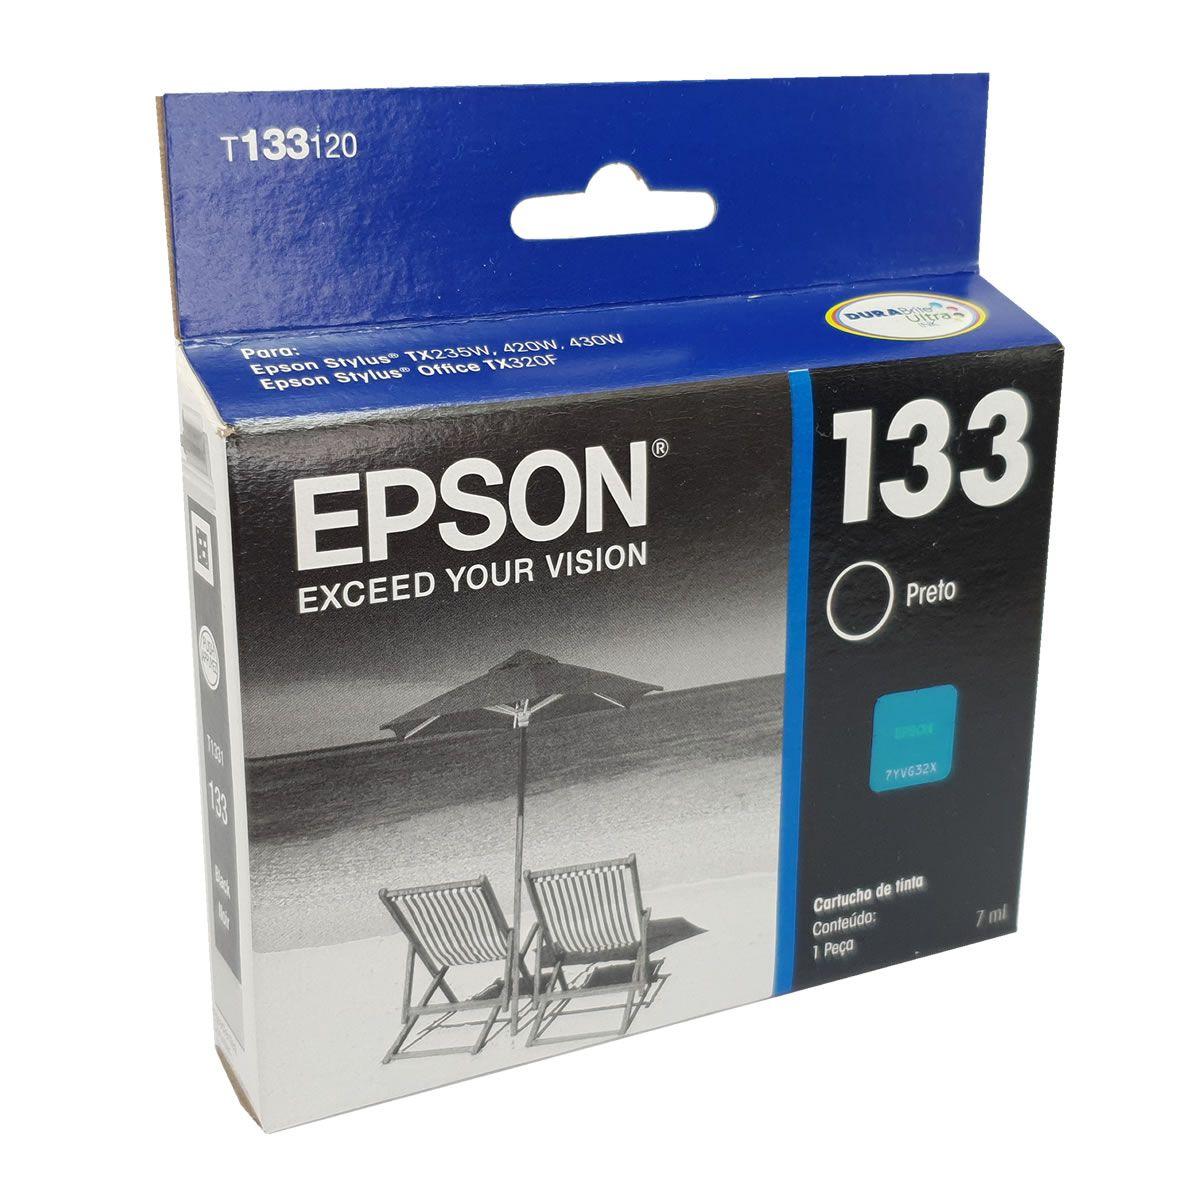 Cartucho T1331 133 preto original Epson para T25 TX235W TX420W TX430W TX320F